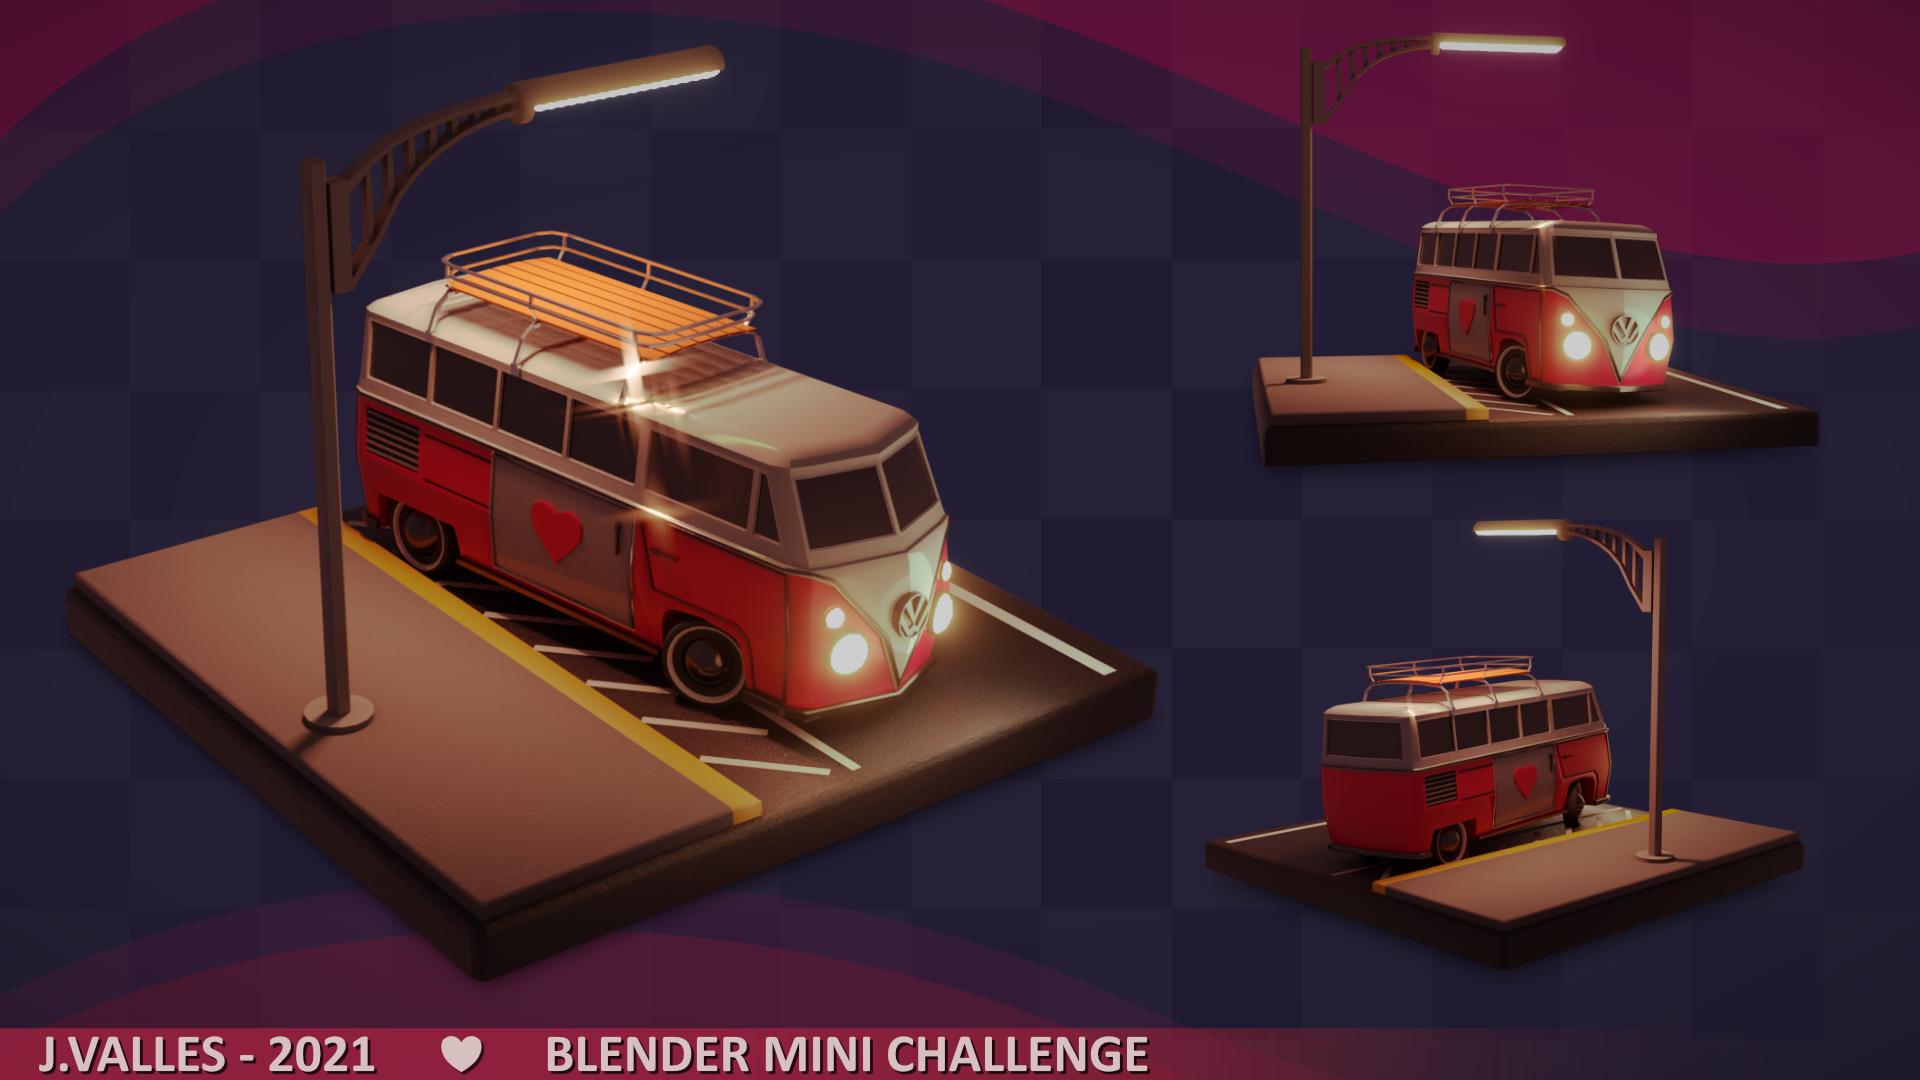 Combi - Blender mini challenge